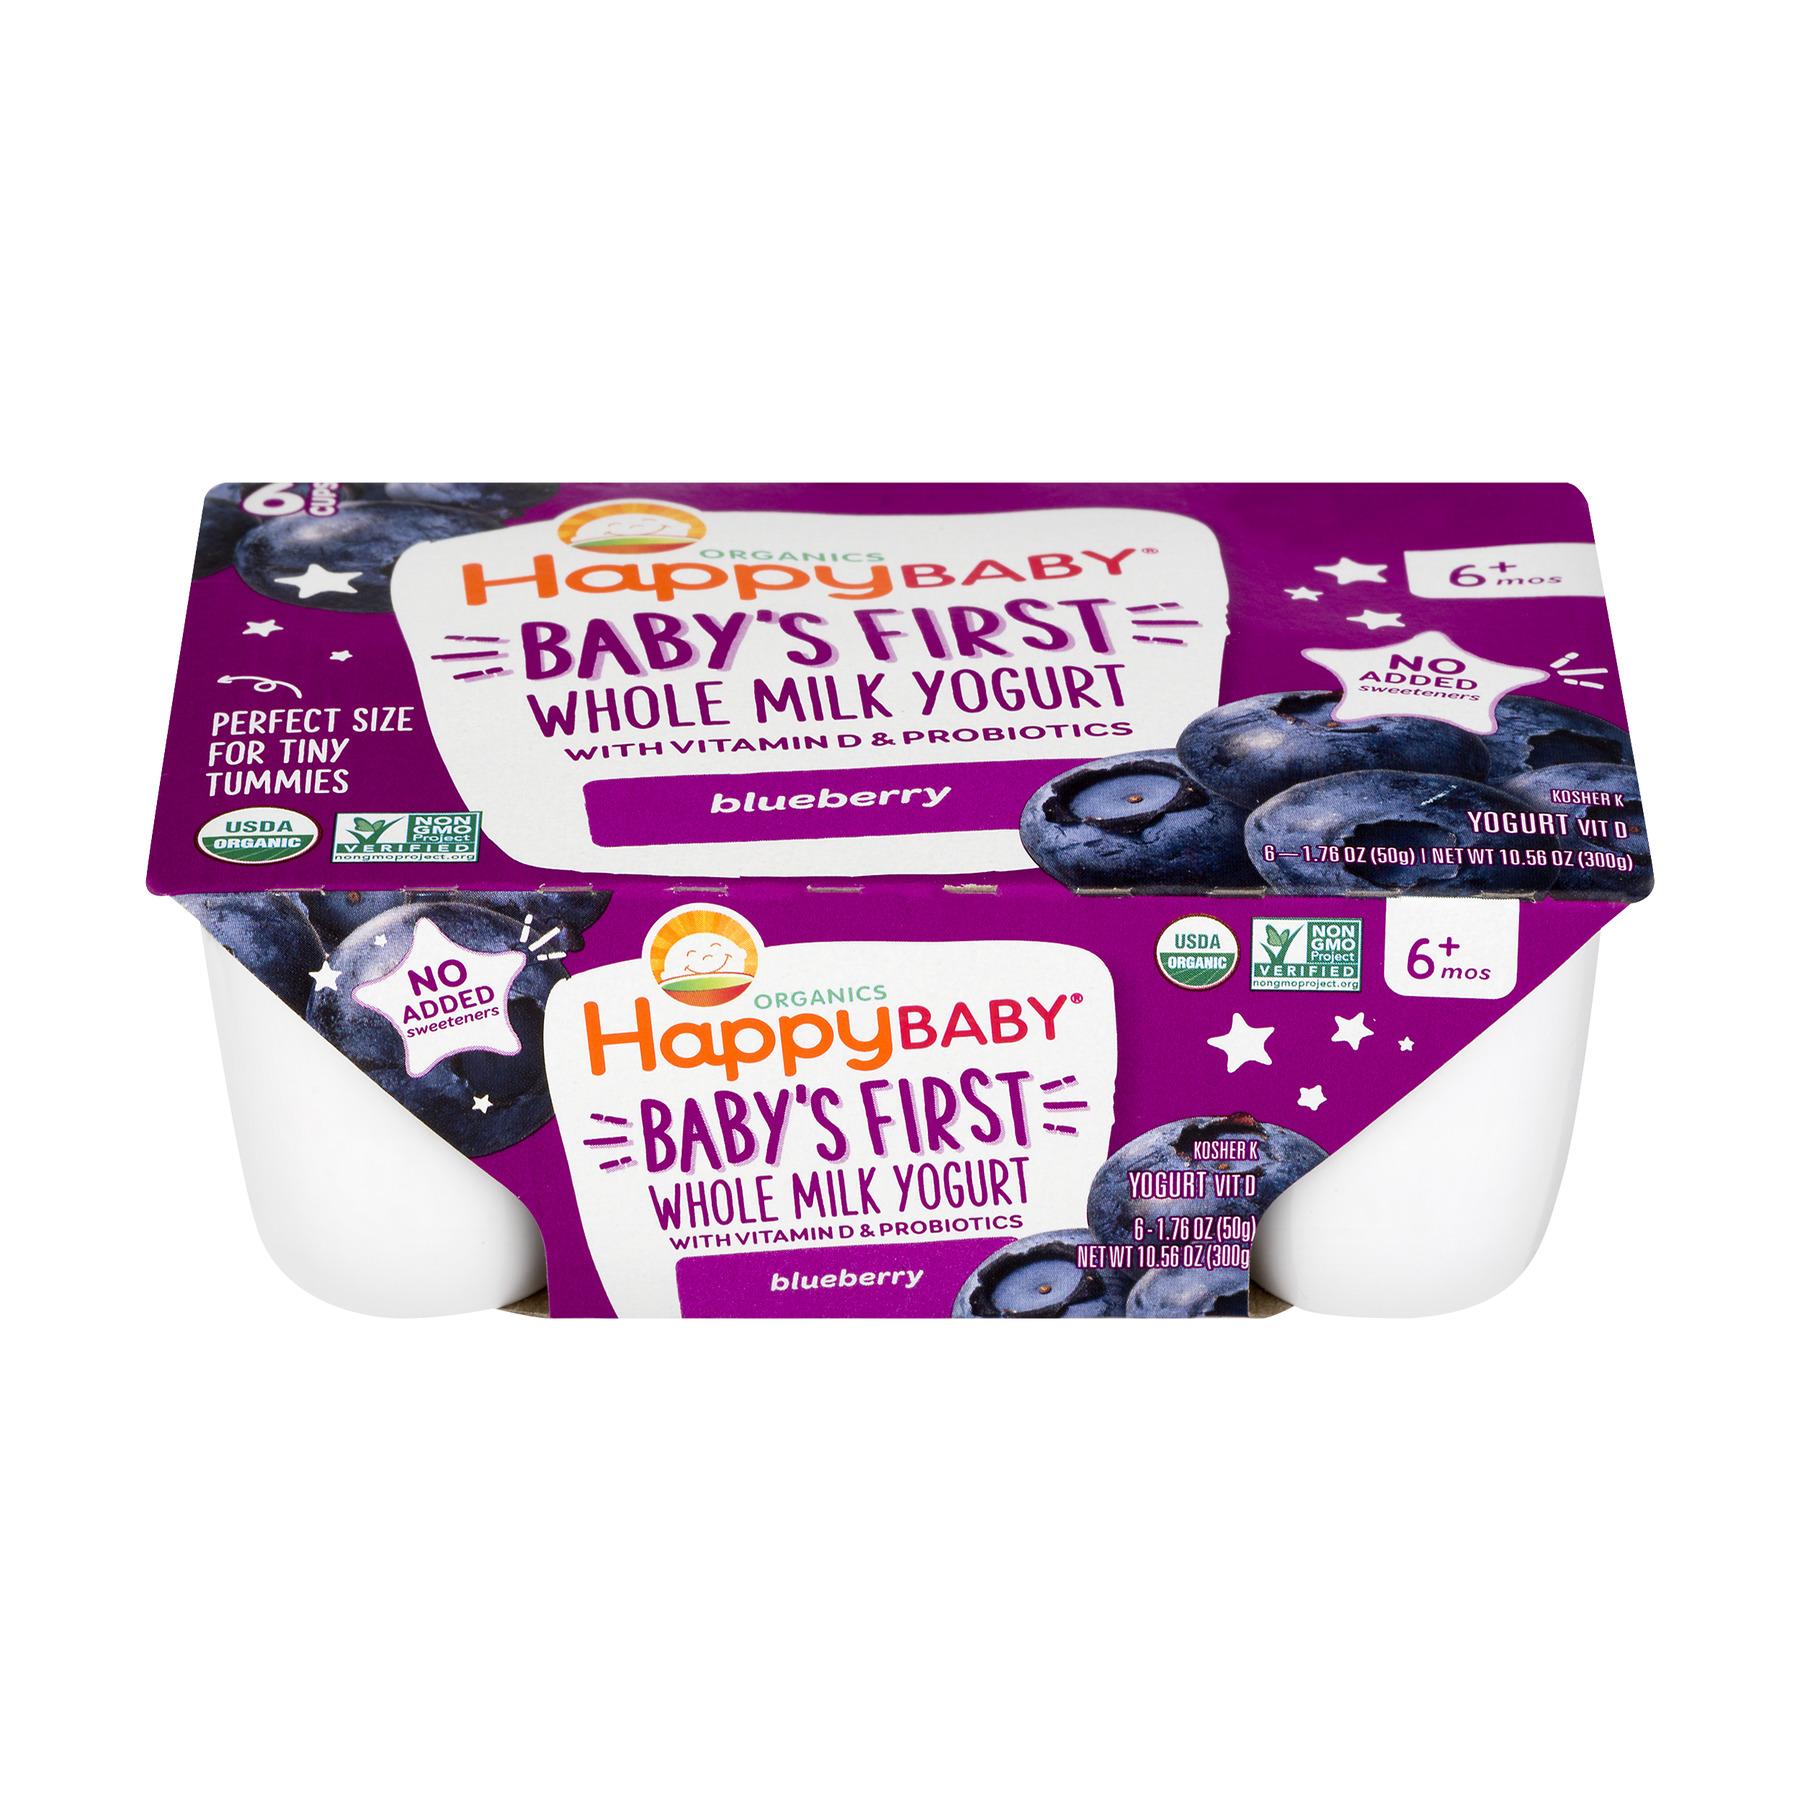 Happy Baby Organics Baby's First Blueberry Whole Milk Yogurt,1.76 Oz., 6 Cups